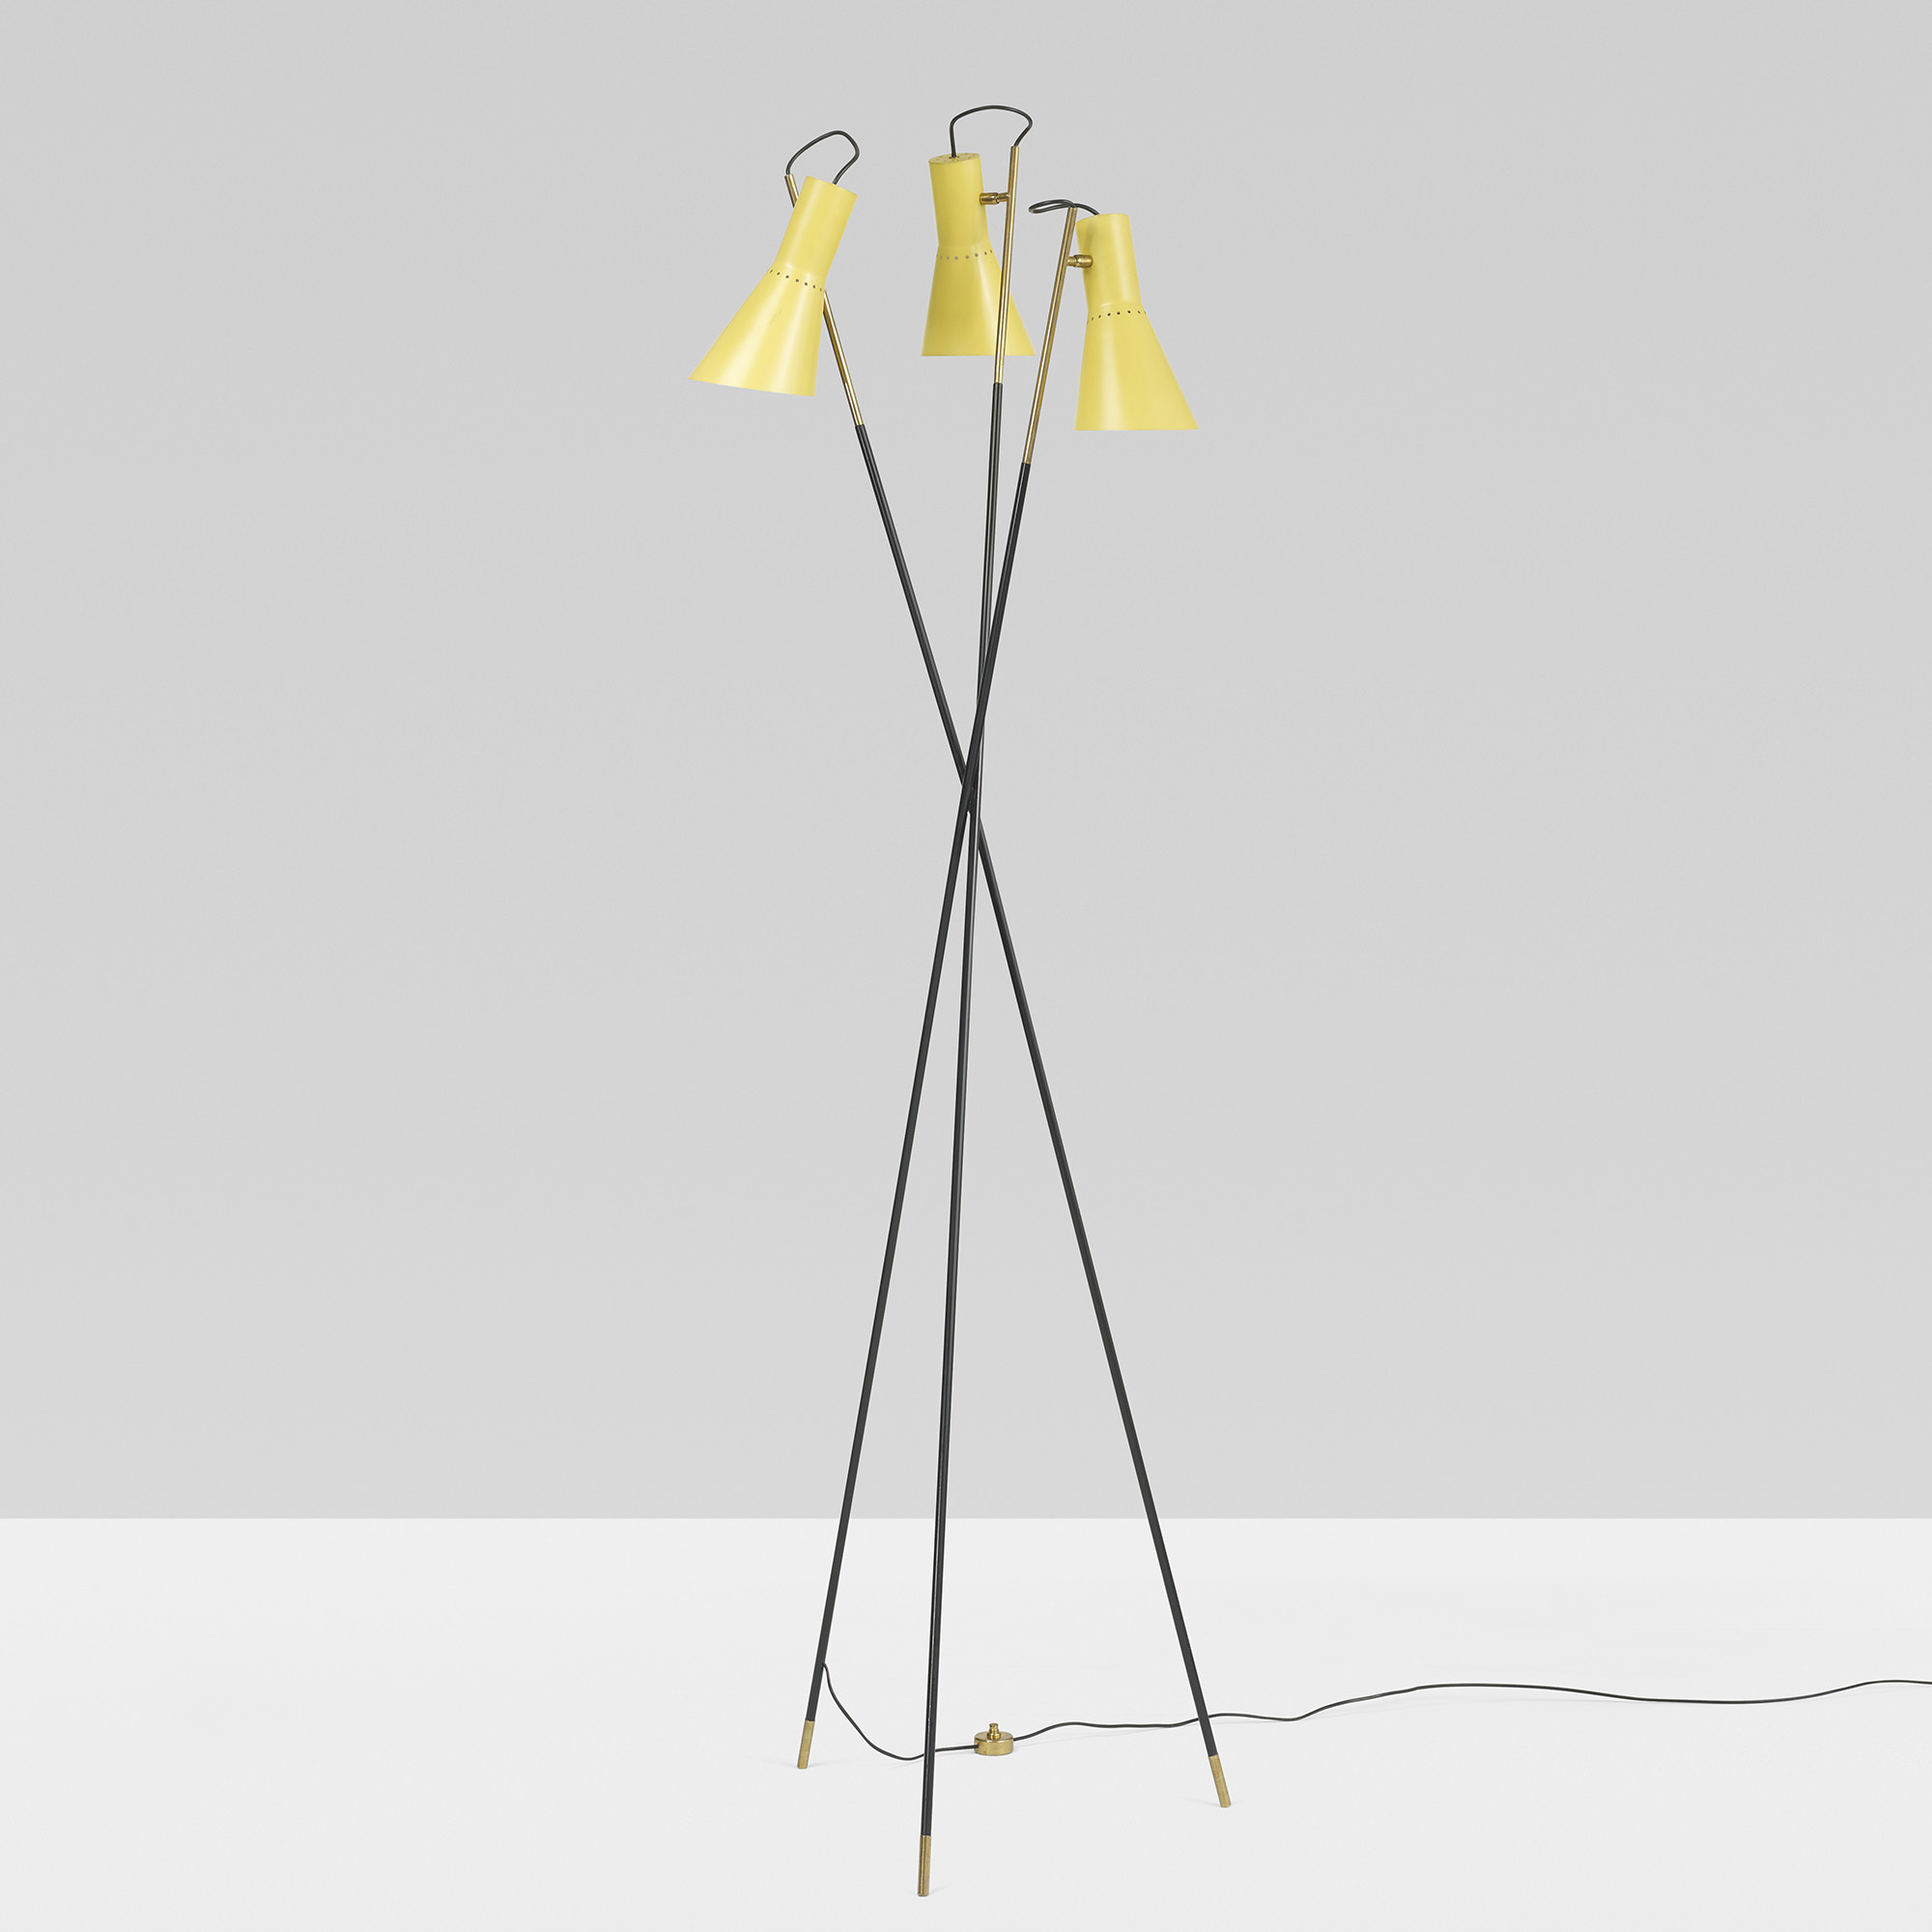 231: Stilnovo / three-arm floor lamp < Design, 12 June 2014 ...